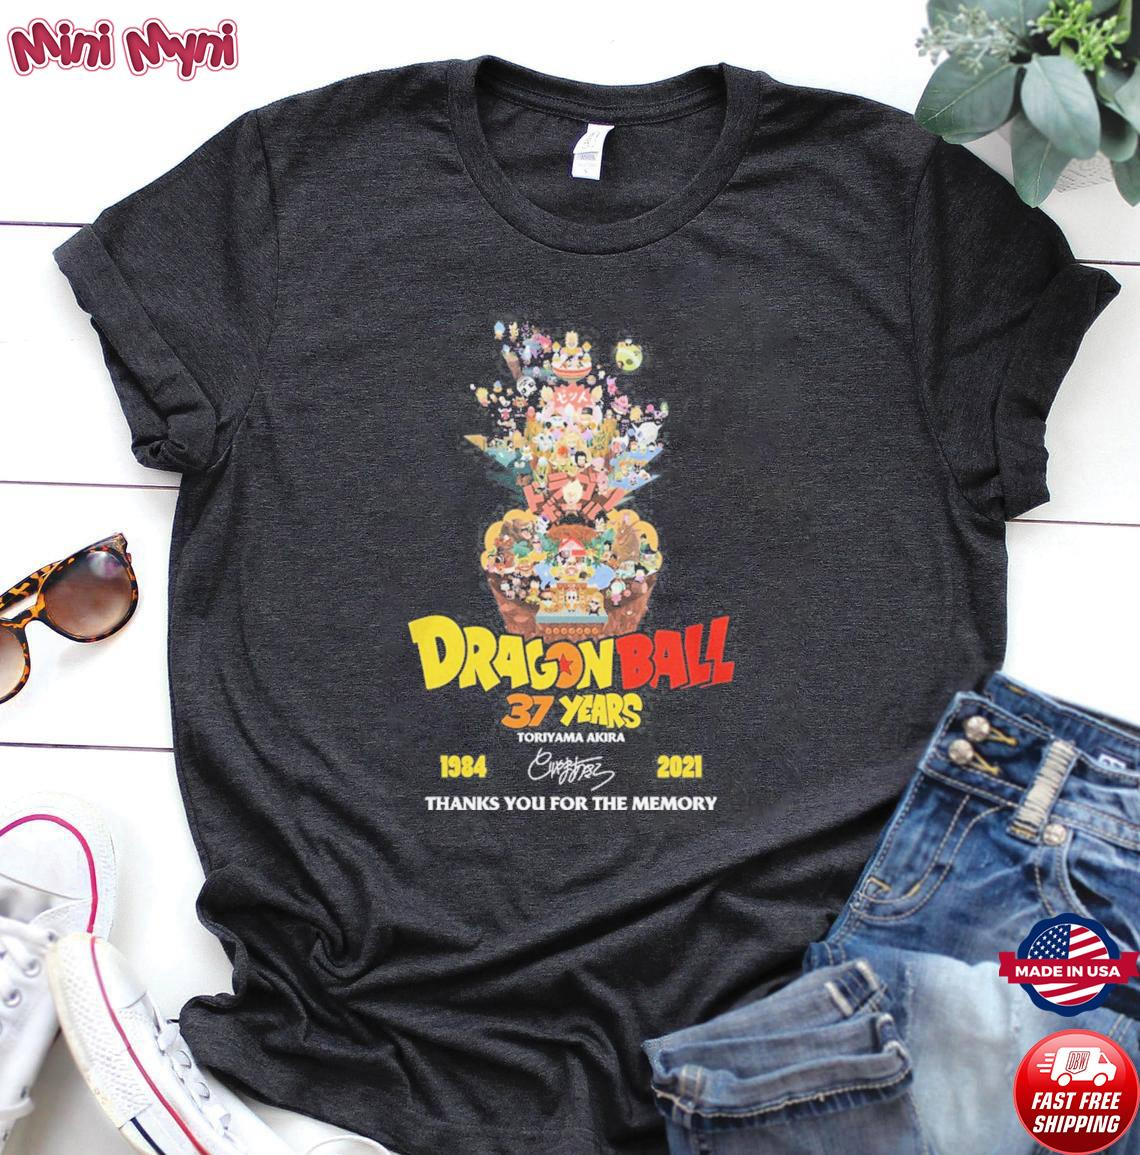 Dragon Ball 37 years Toriyama Akira 1984 2021 signature thanks you for the memories shirt